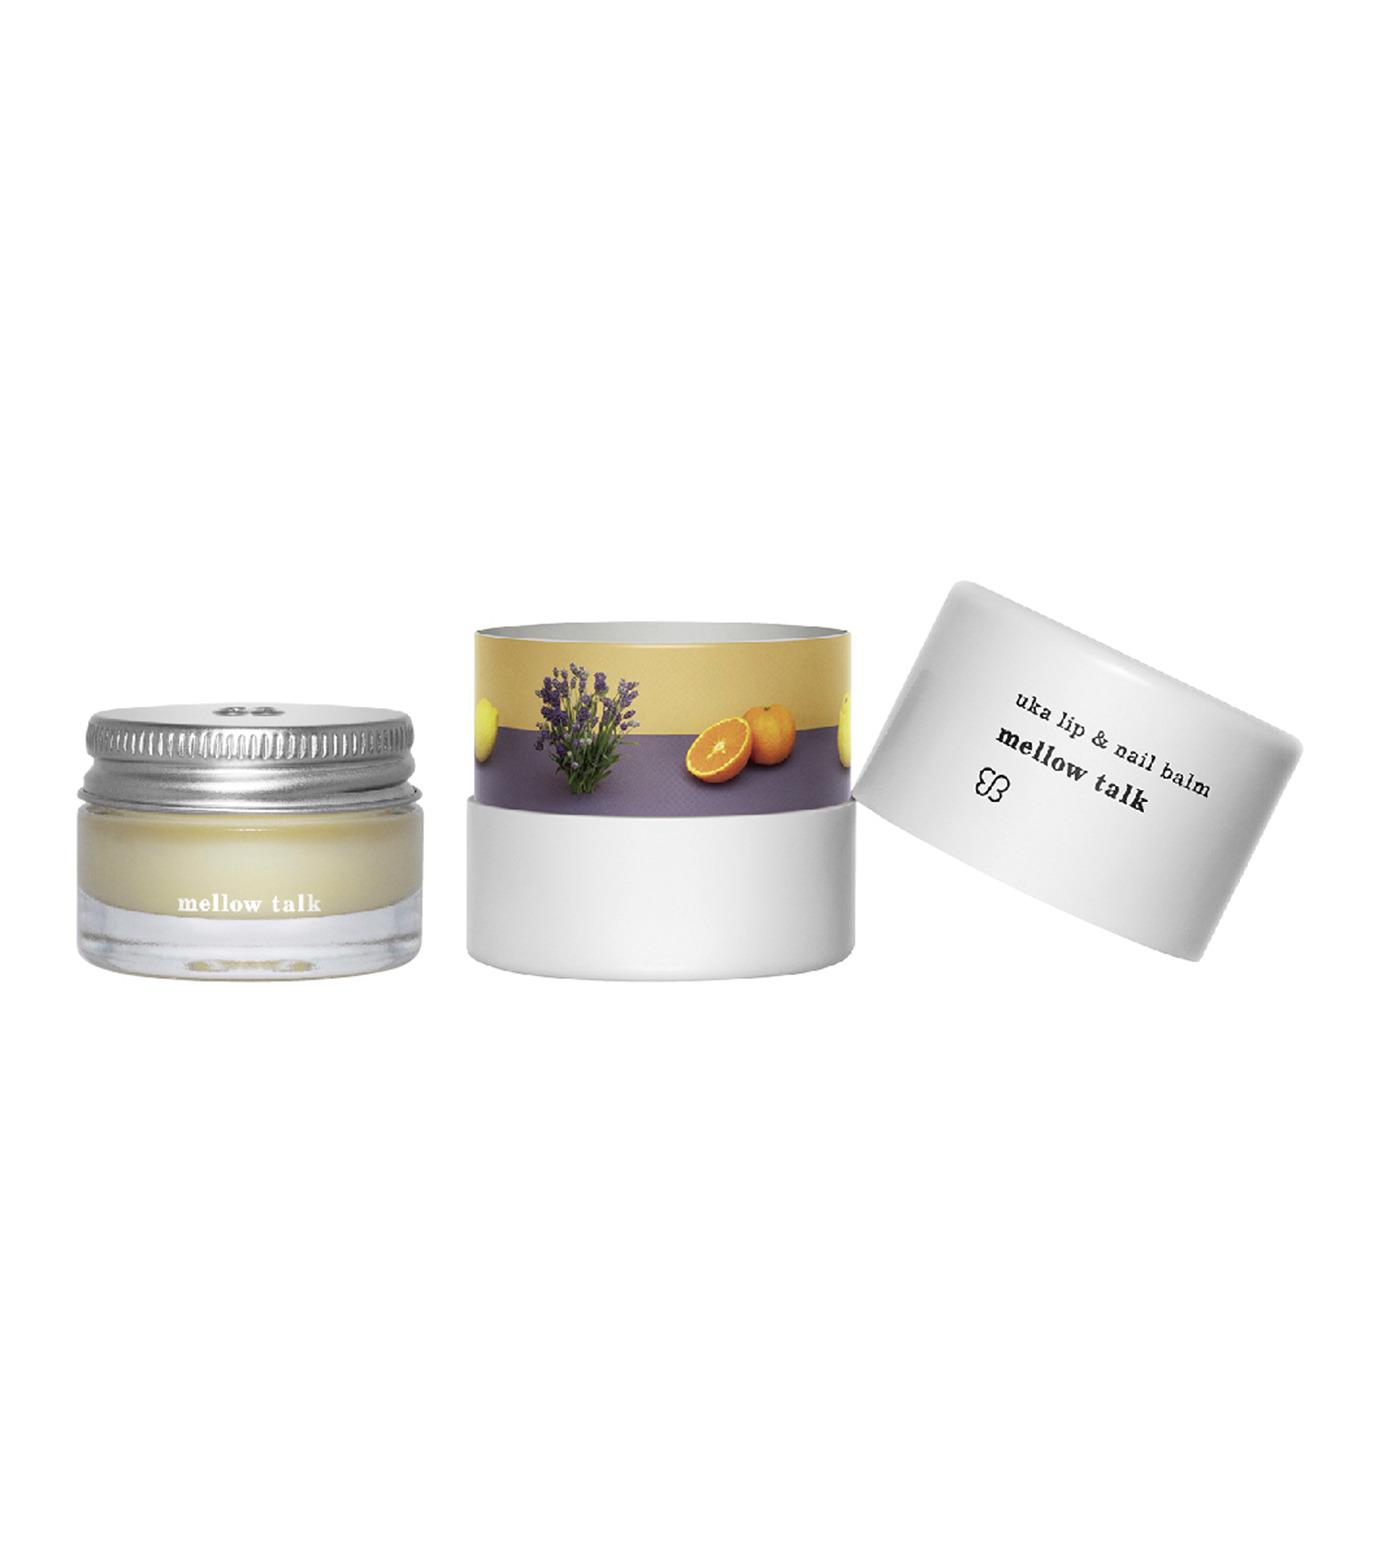 uka(ウカ)のuka lip & nail balm mellow talk-WHITE(コスメティックス/cosmetics)-3000020-4 拡大詳細画像1